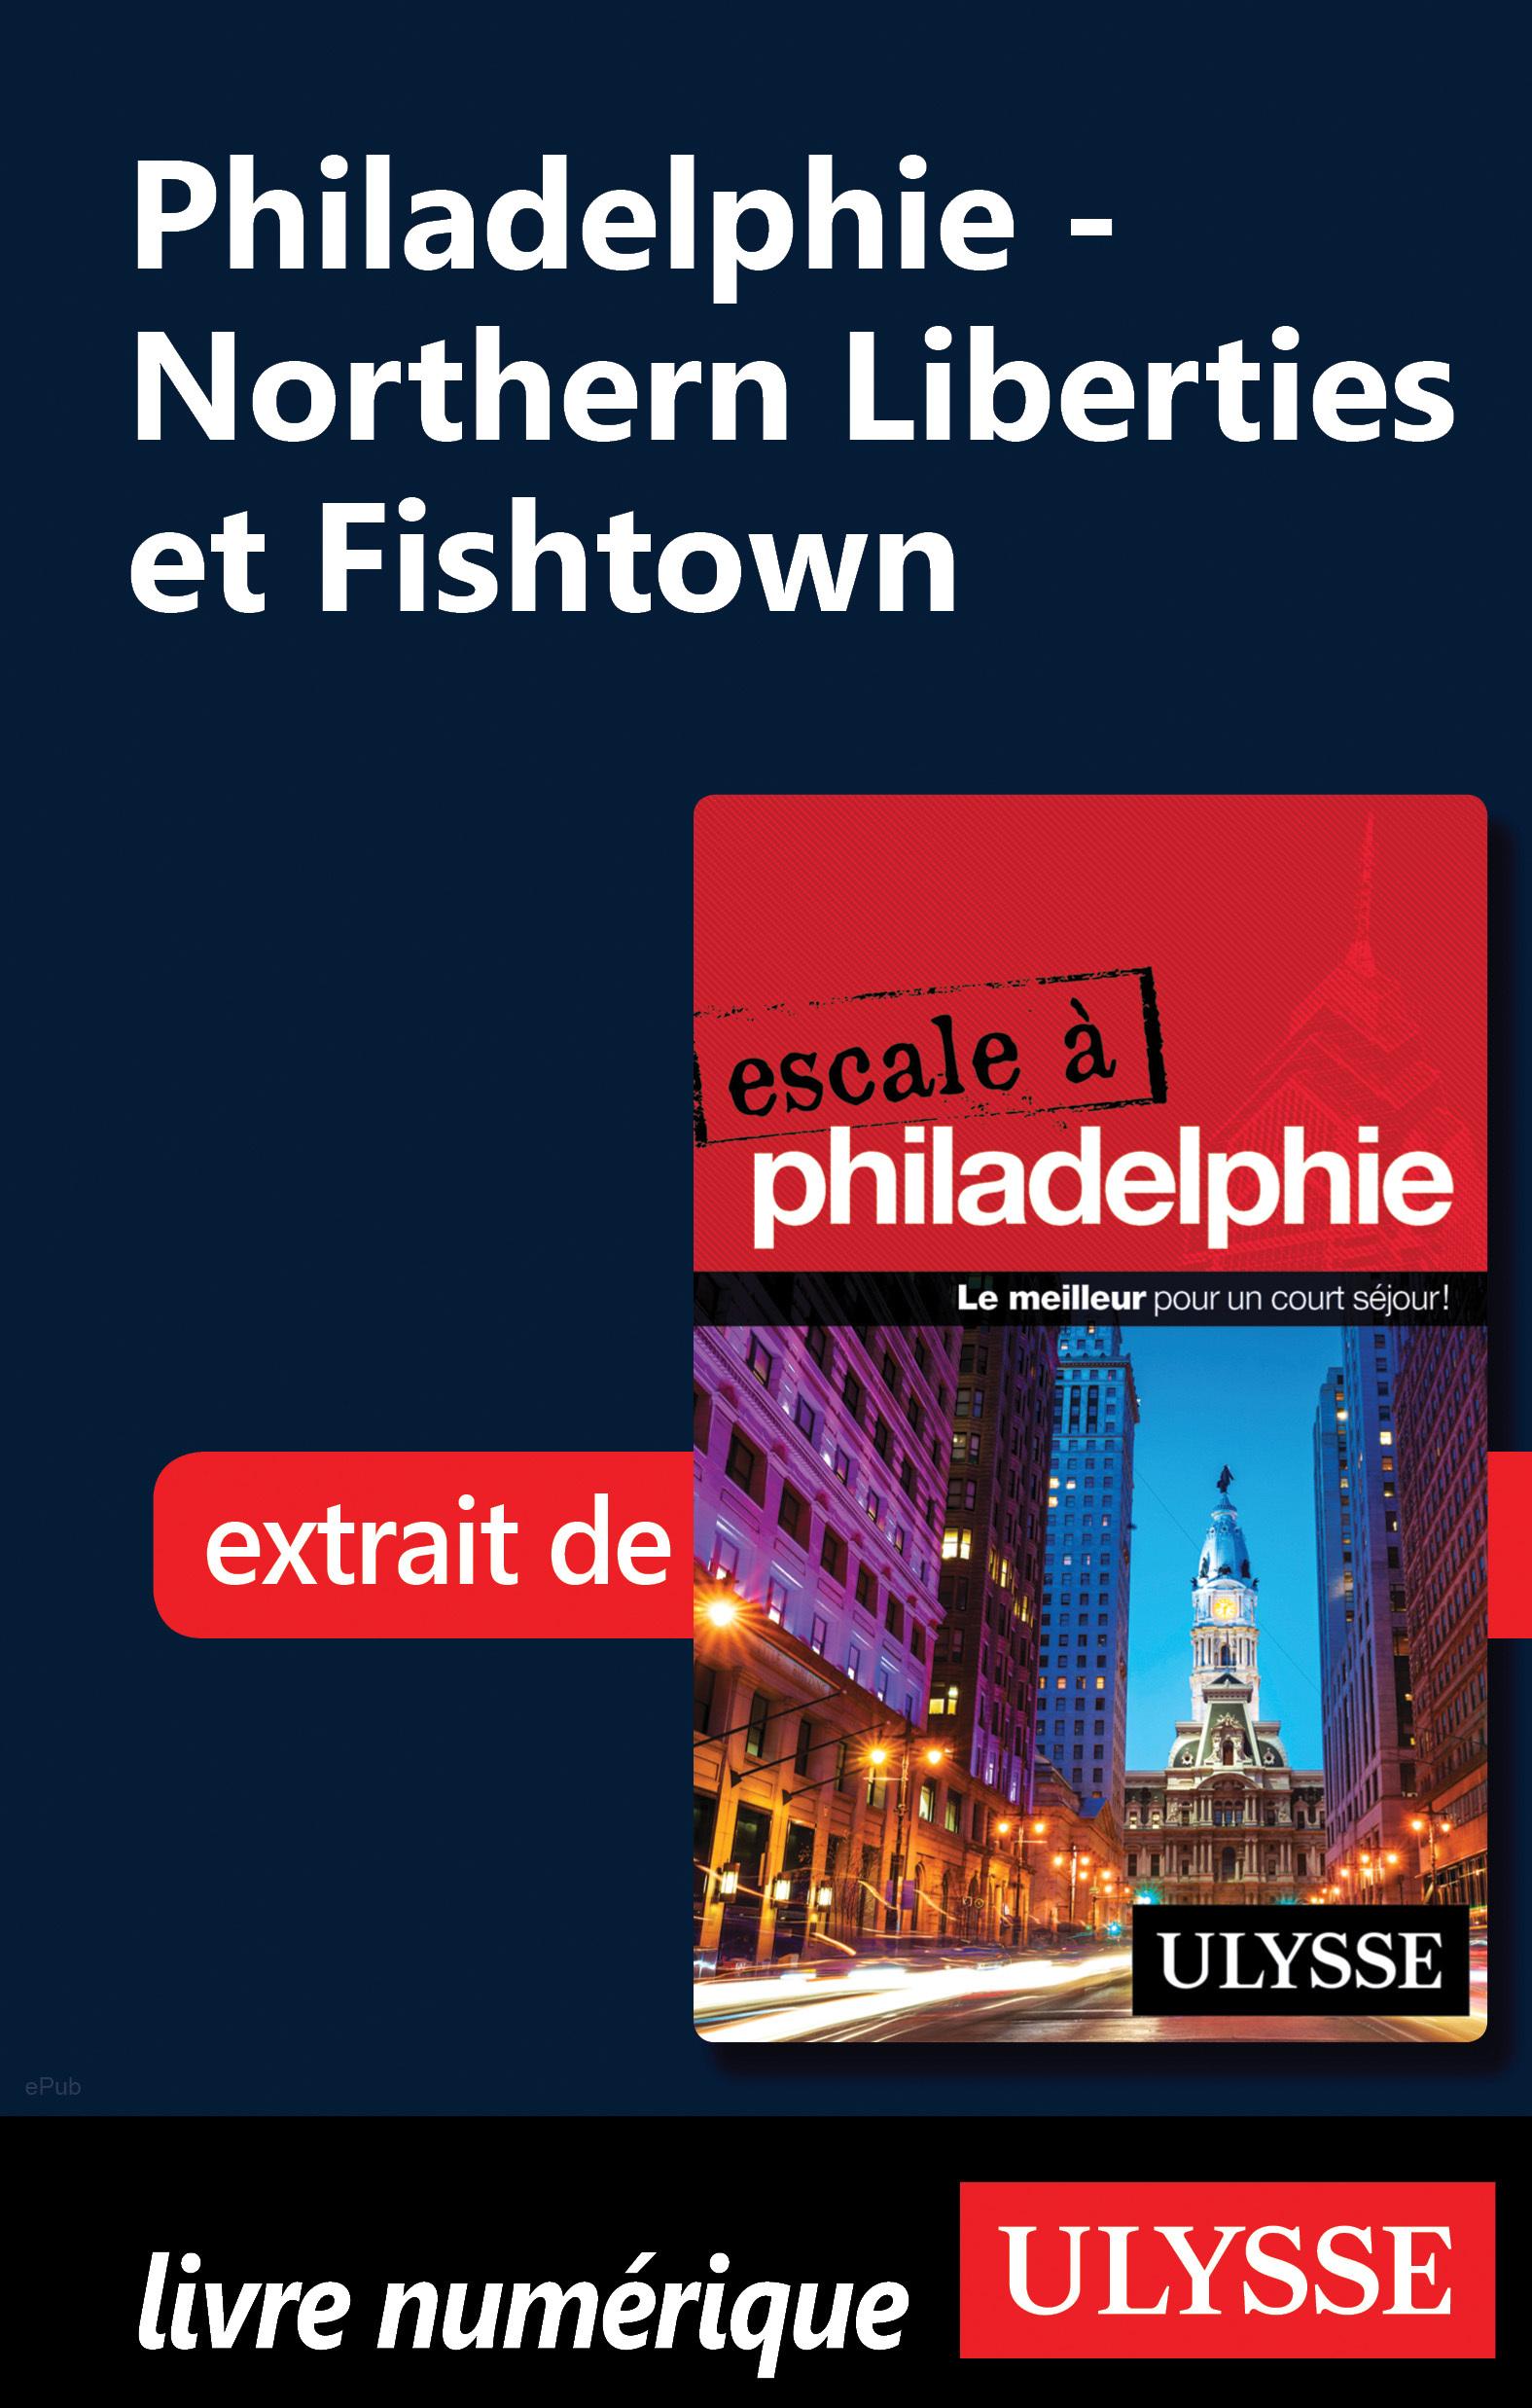 Philadelphie - Northern Liberties et Fishtown